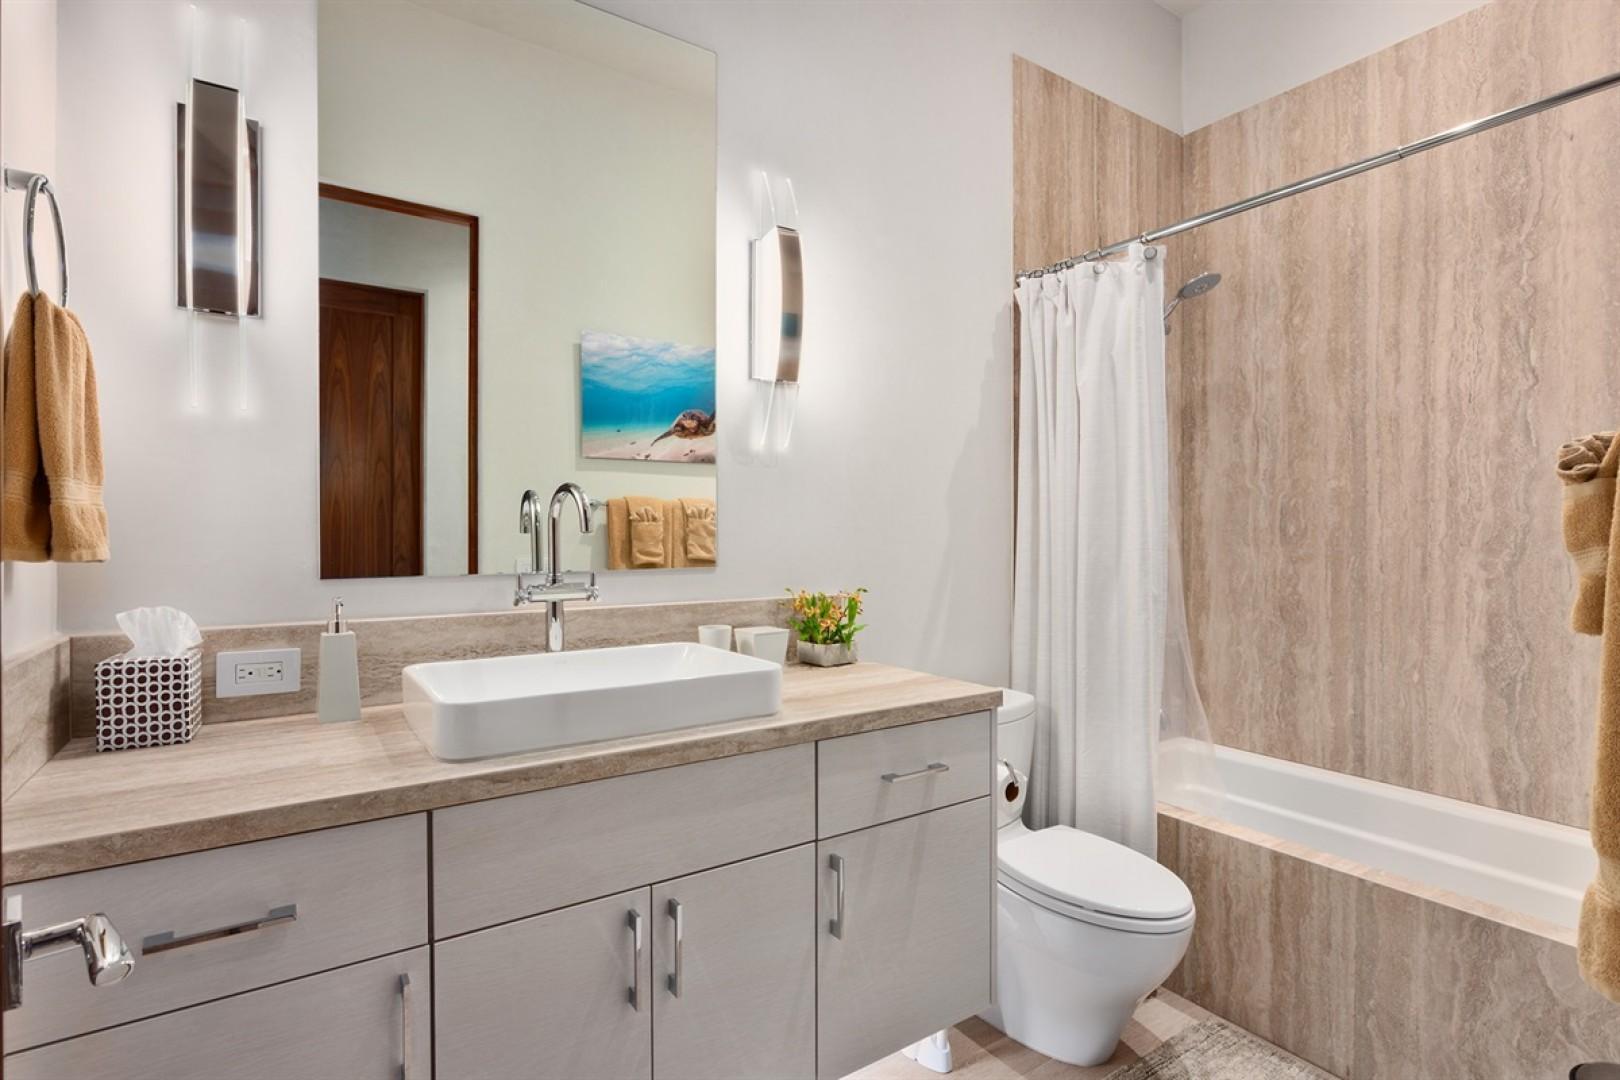 Adjacent full bath with tub/shower combo.